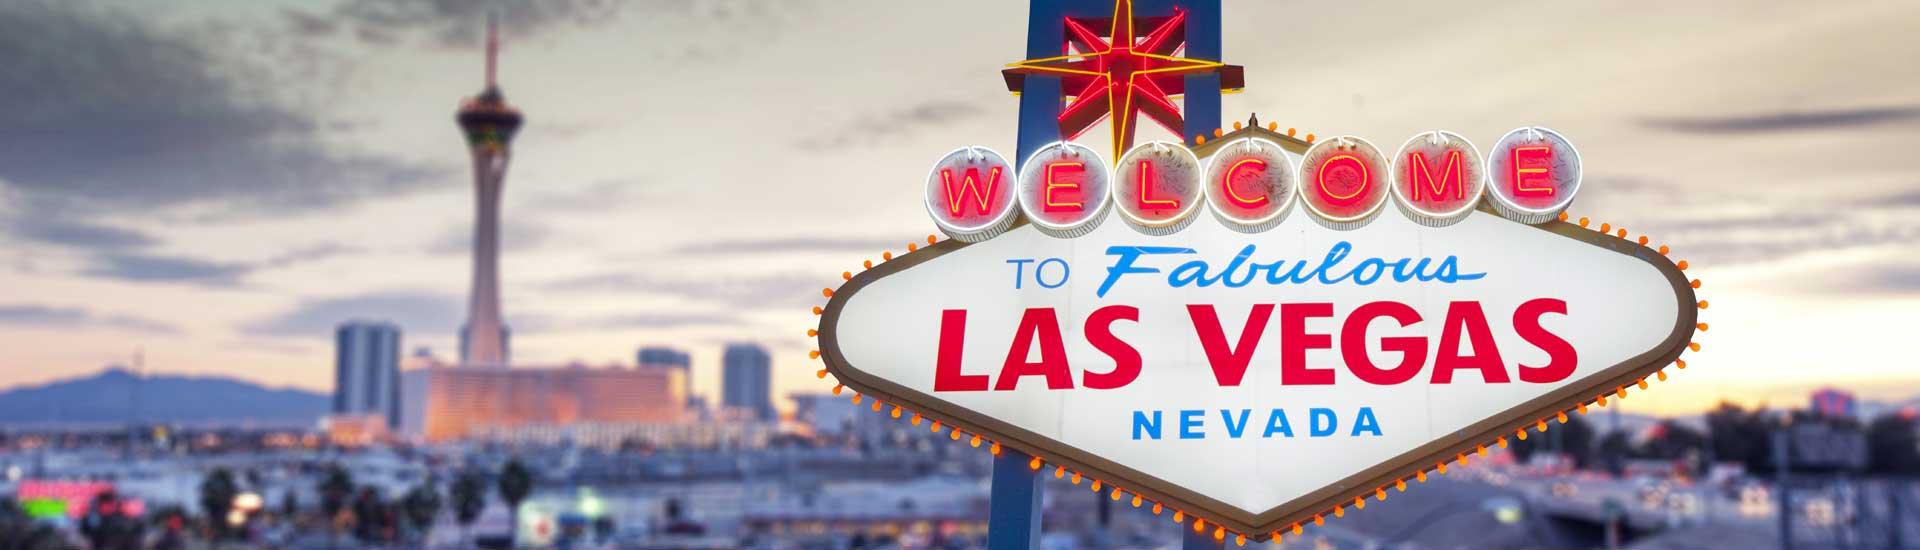 Las Vegas Dress Code